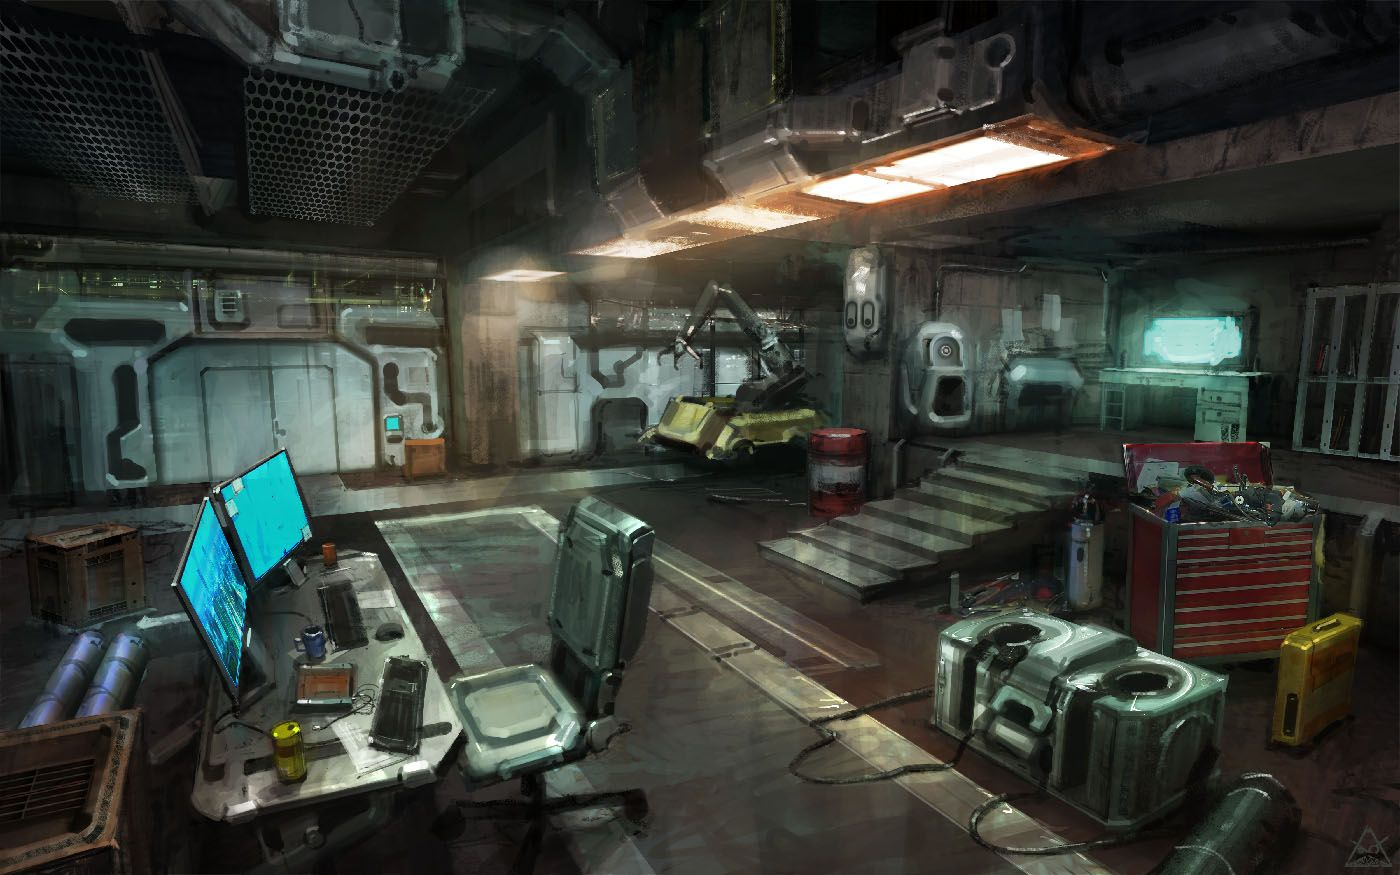 pingl par samuel coipel sur spaceship interior. Black Bedroom Furniture Sets. Home Design Ideas